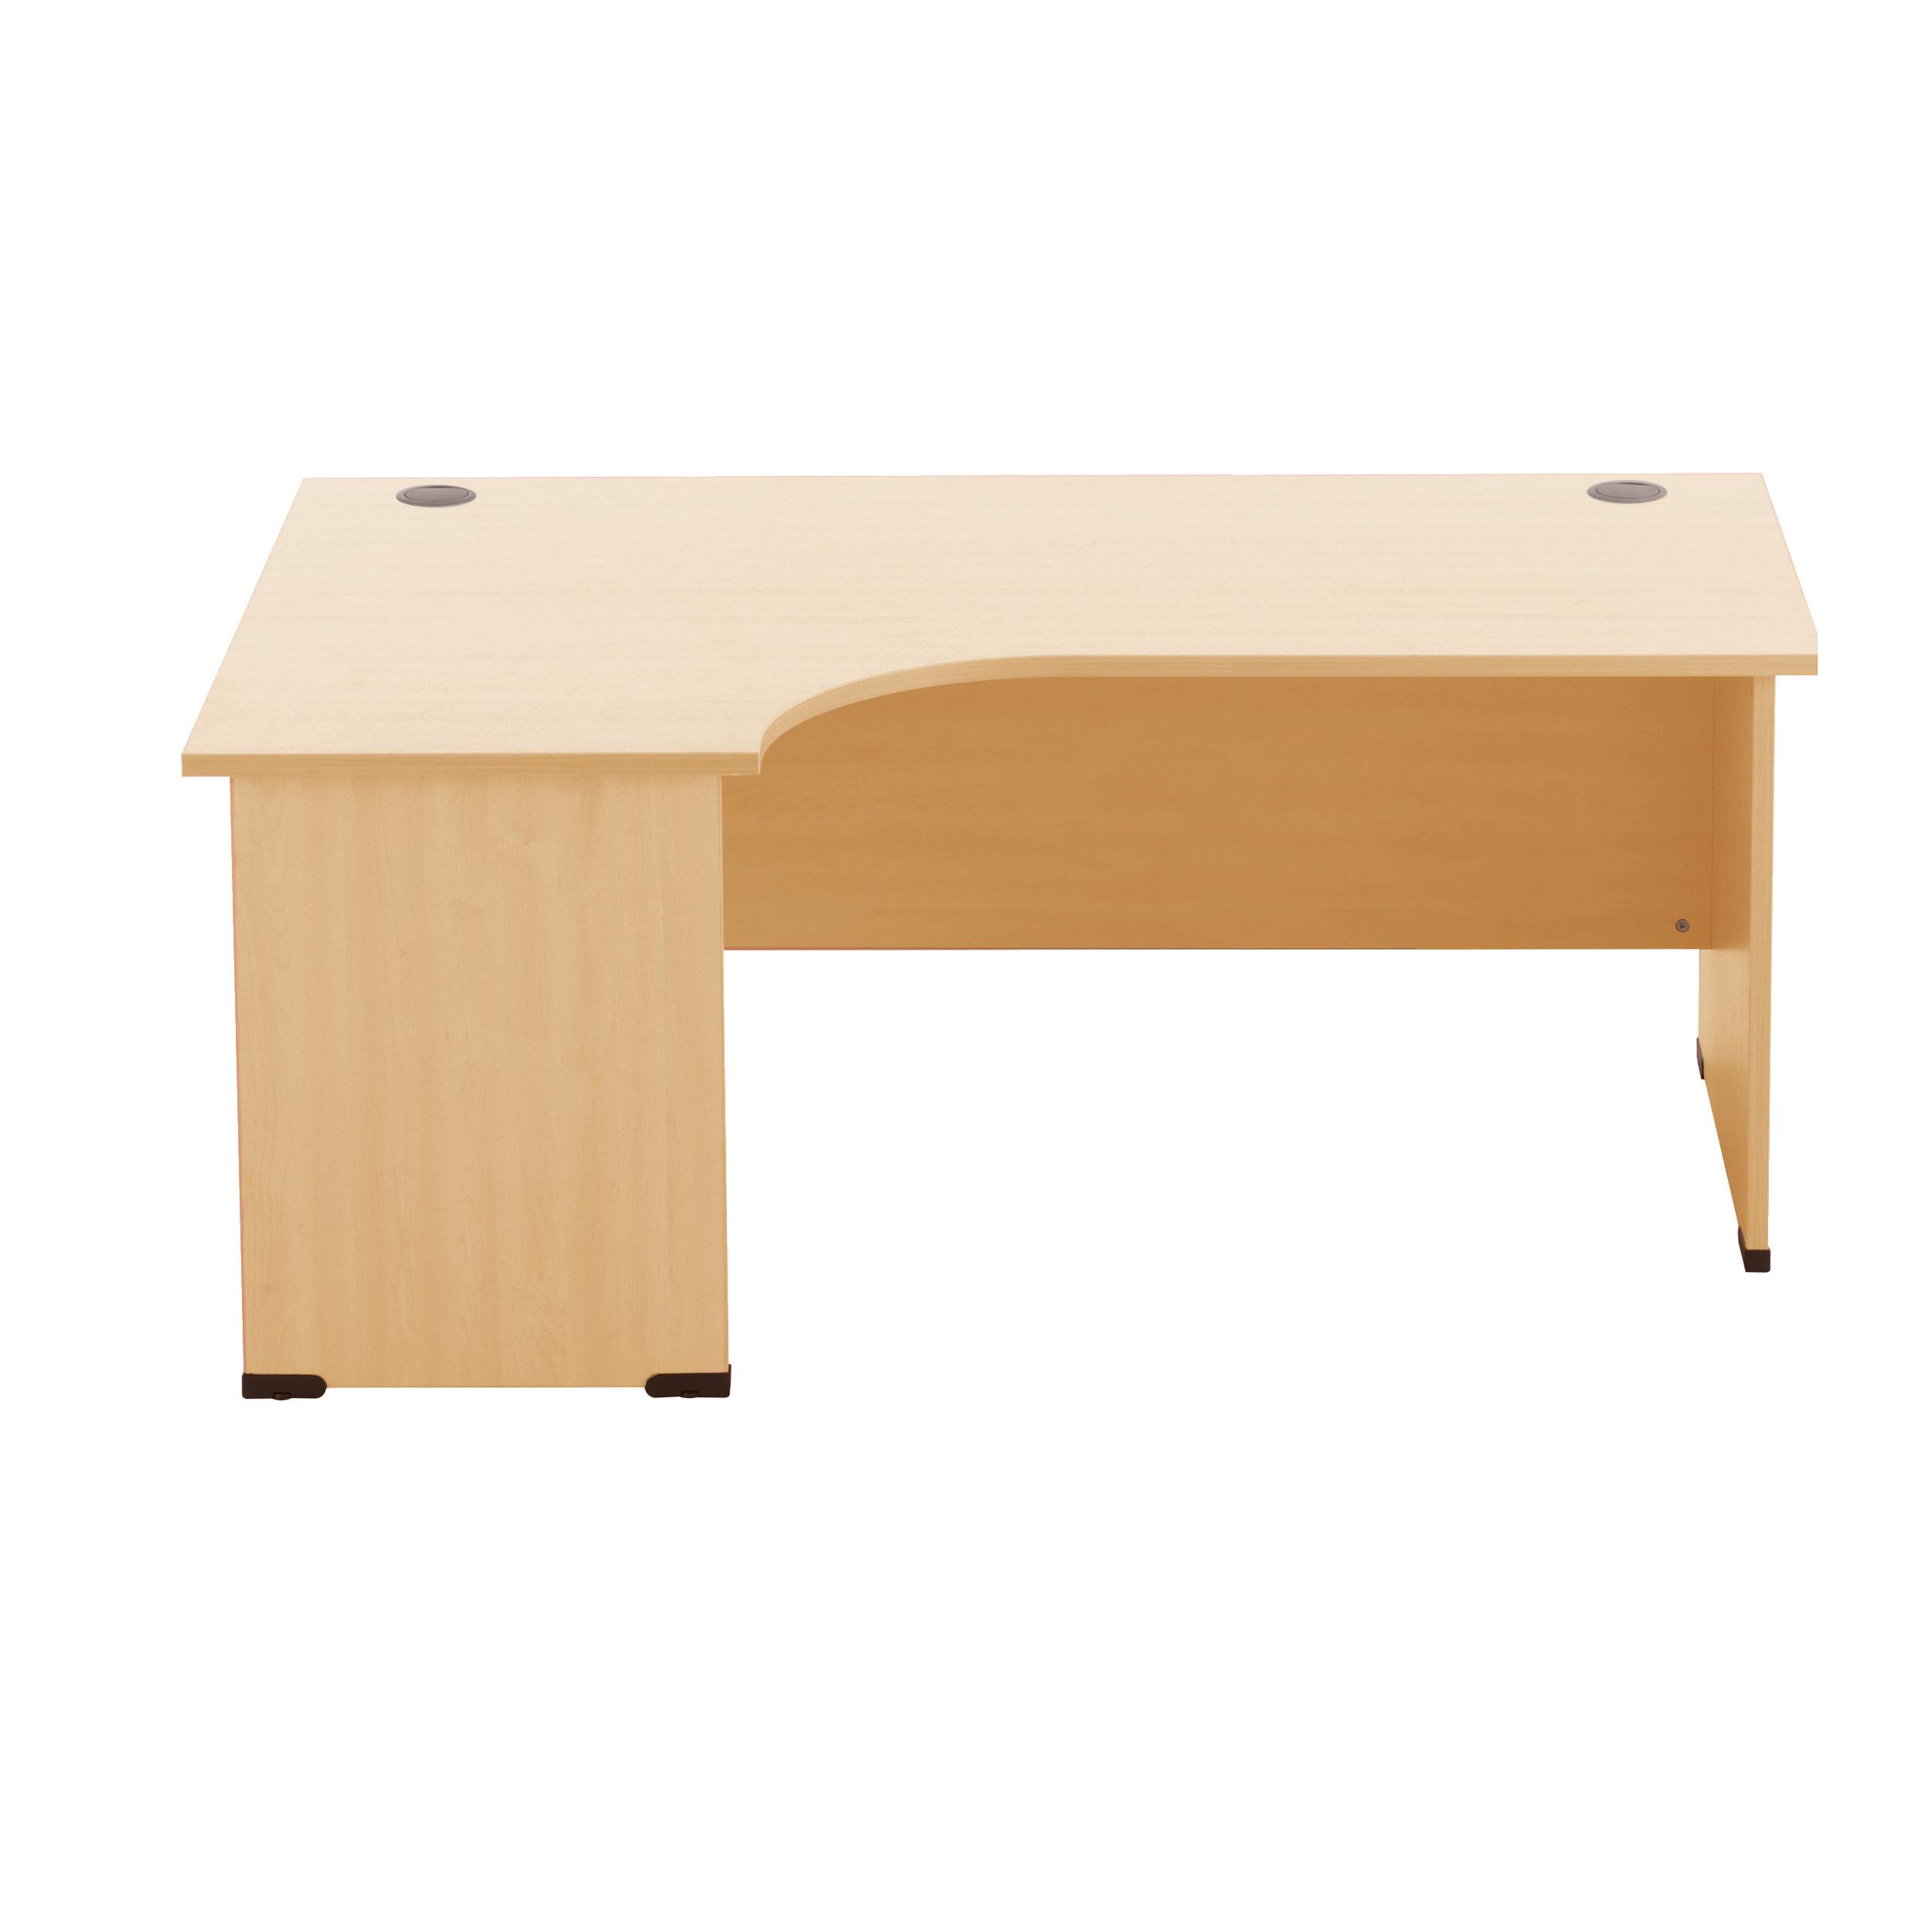 Sonix Radial Desk Left Hand Panel End Legs 1800/1170mm Acer Maple Ref w9411m